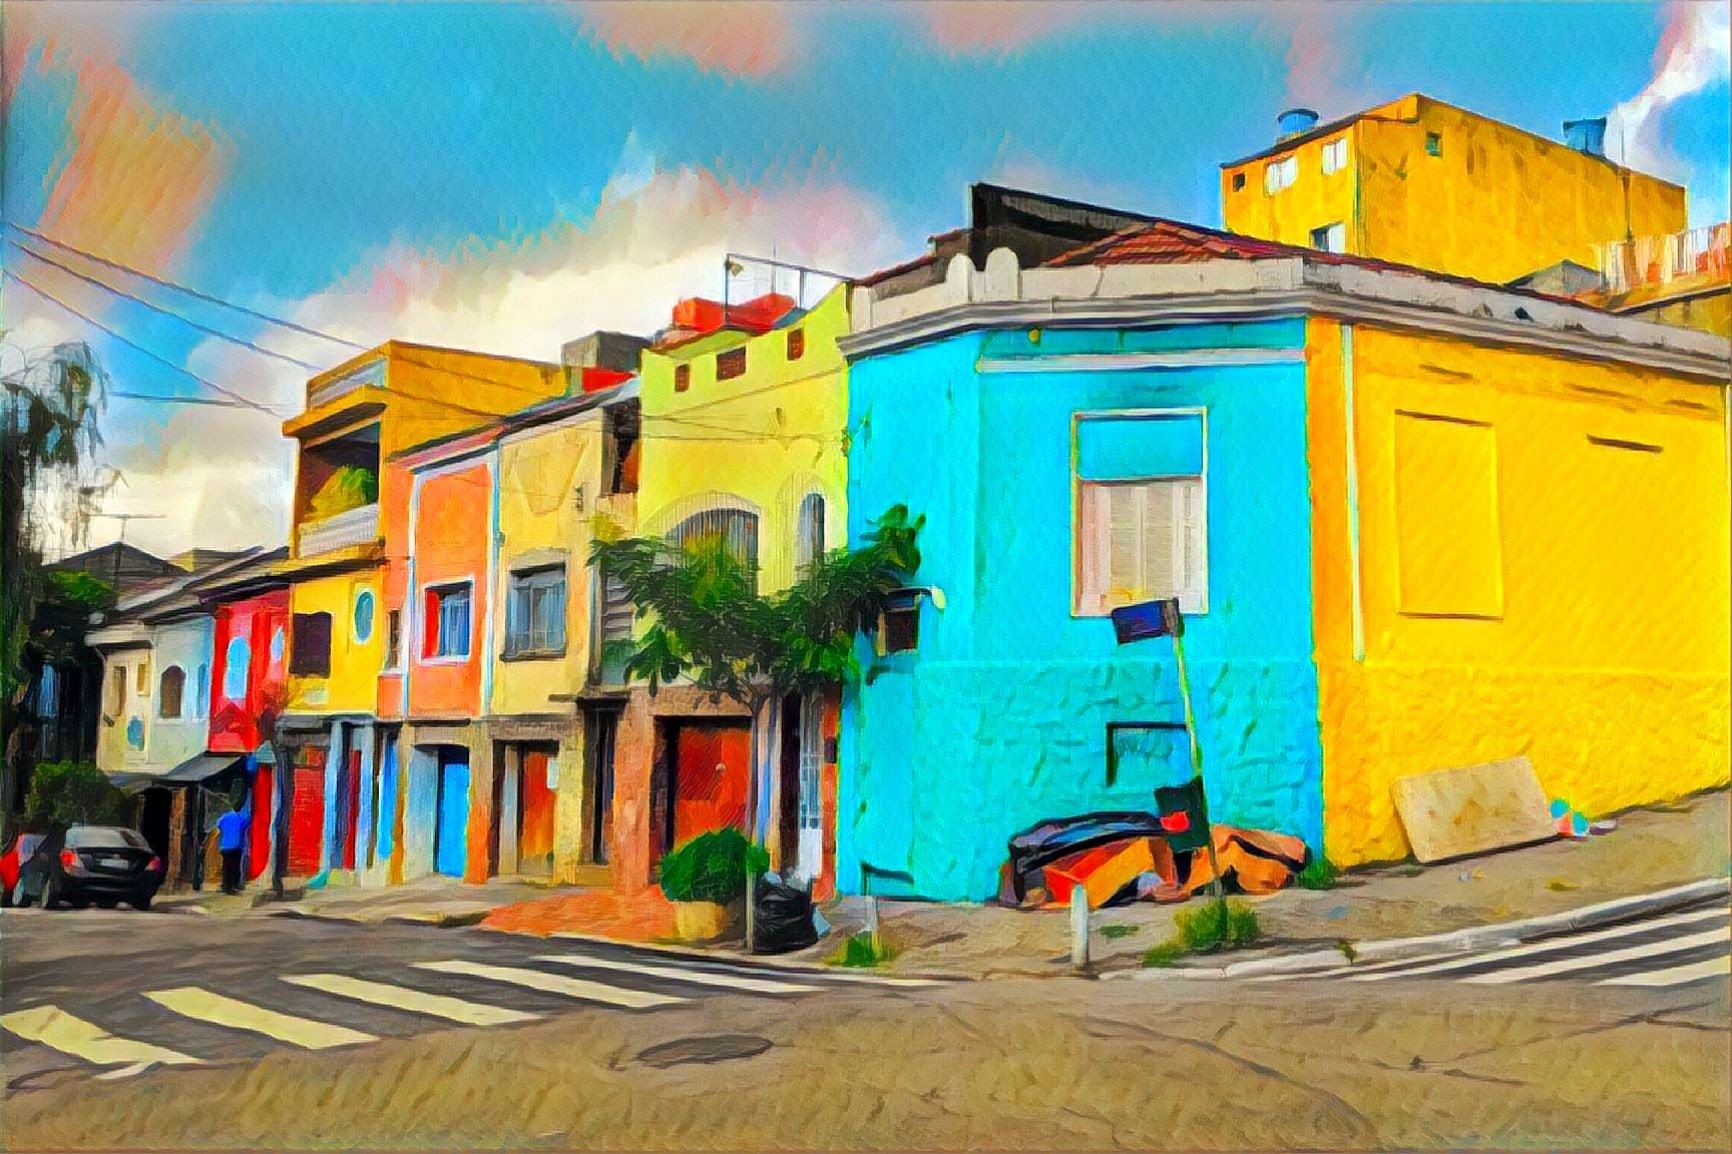 Bela Vista (Bixiga): The Little Italy Of São Paulo